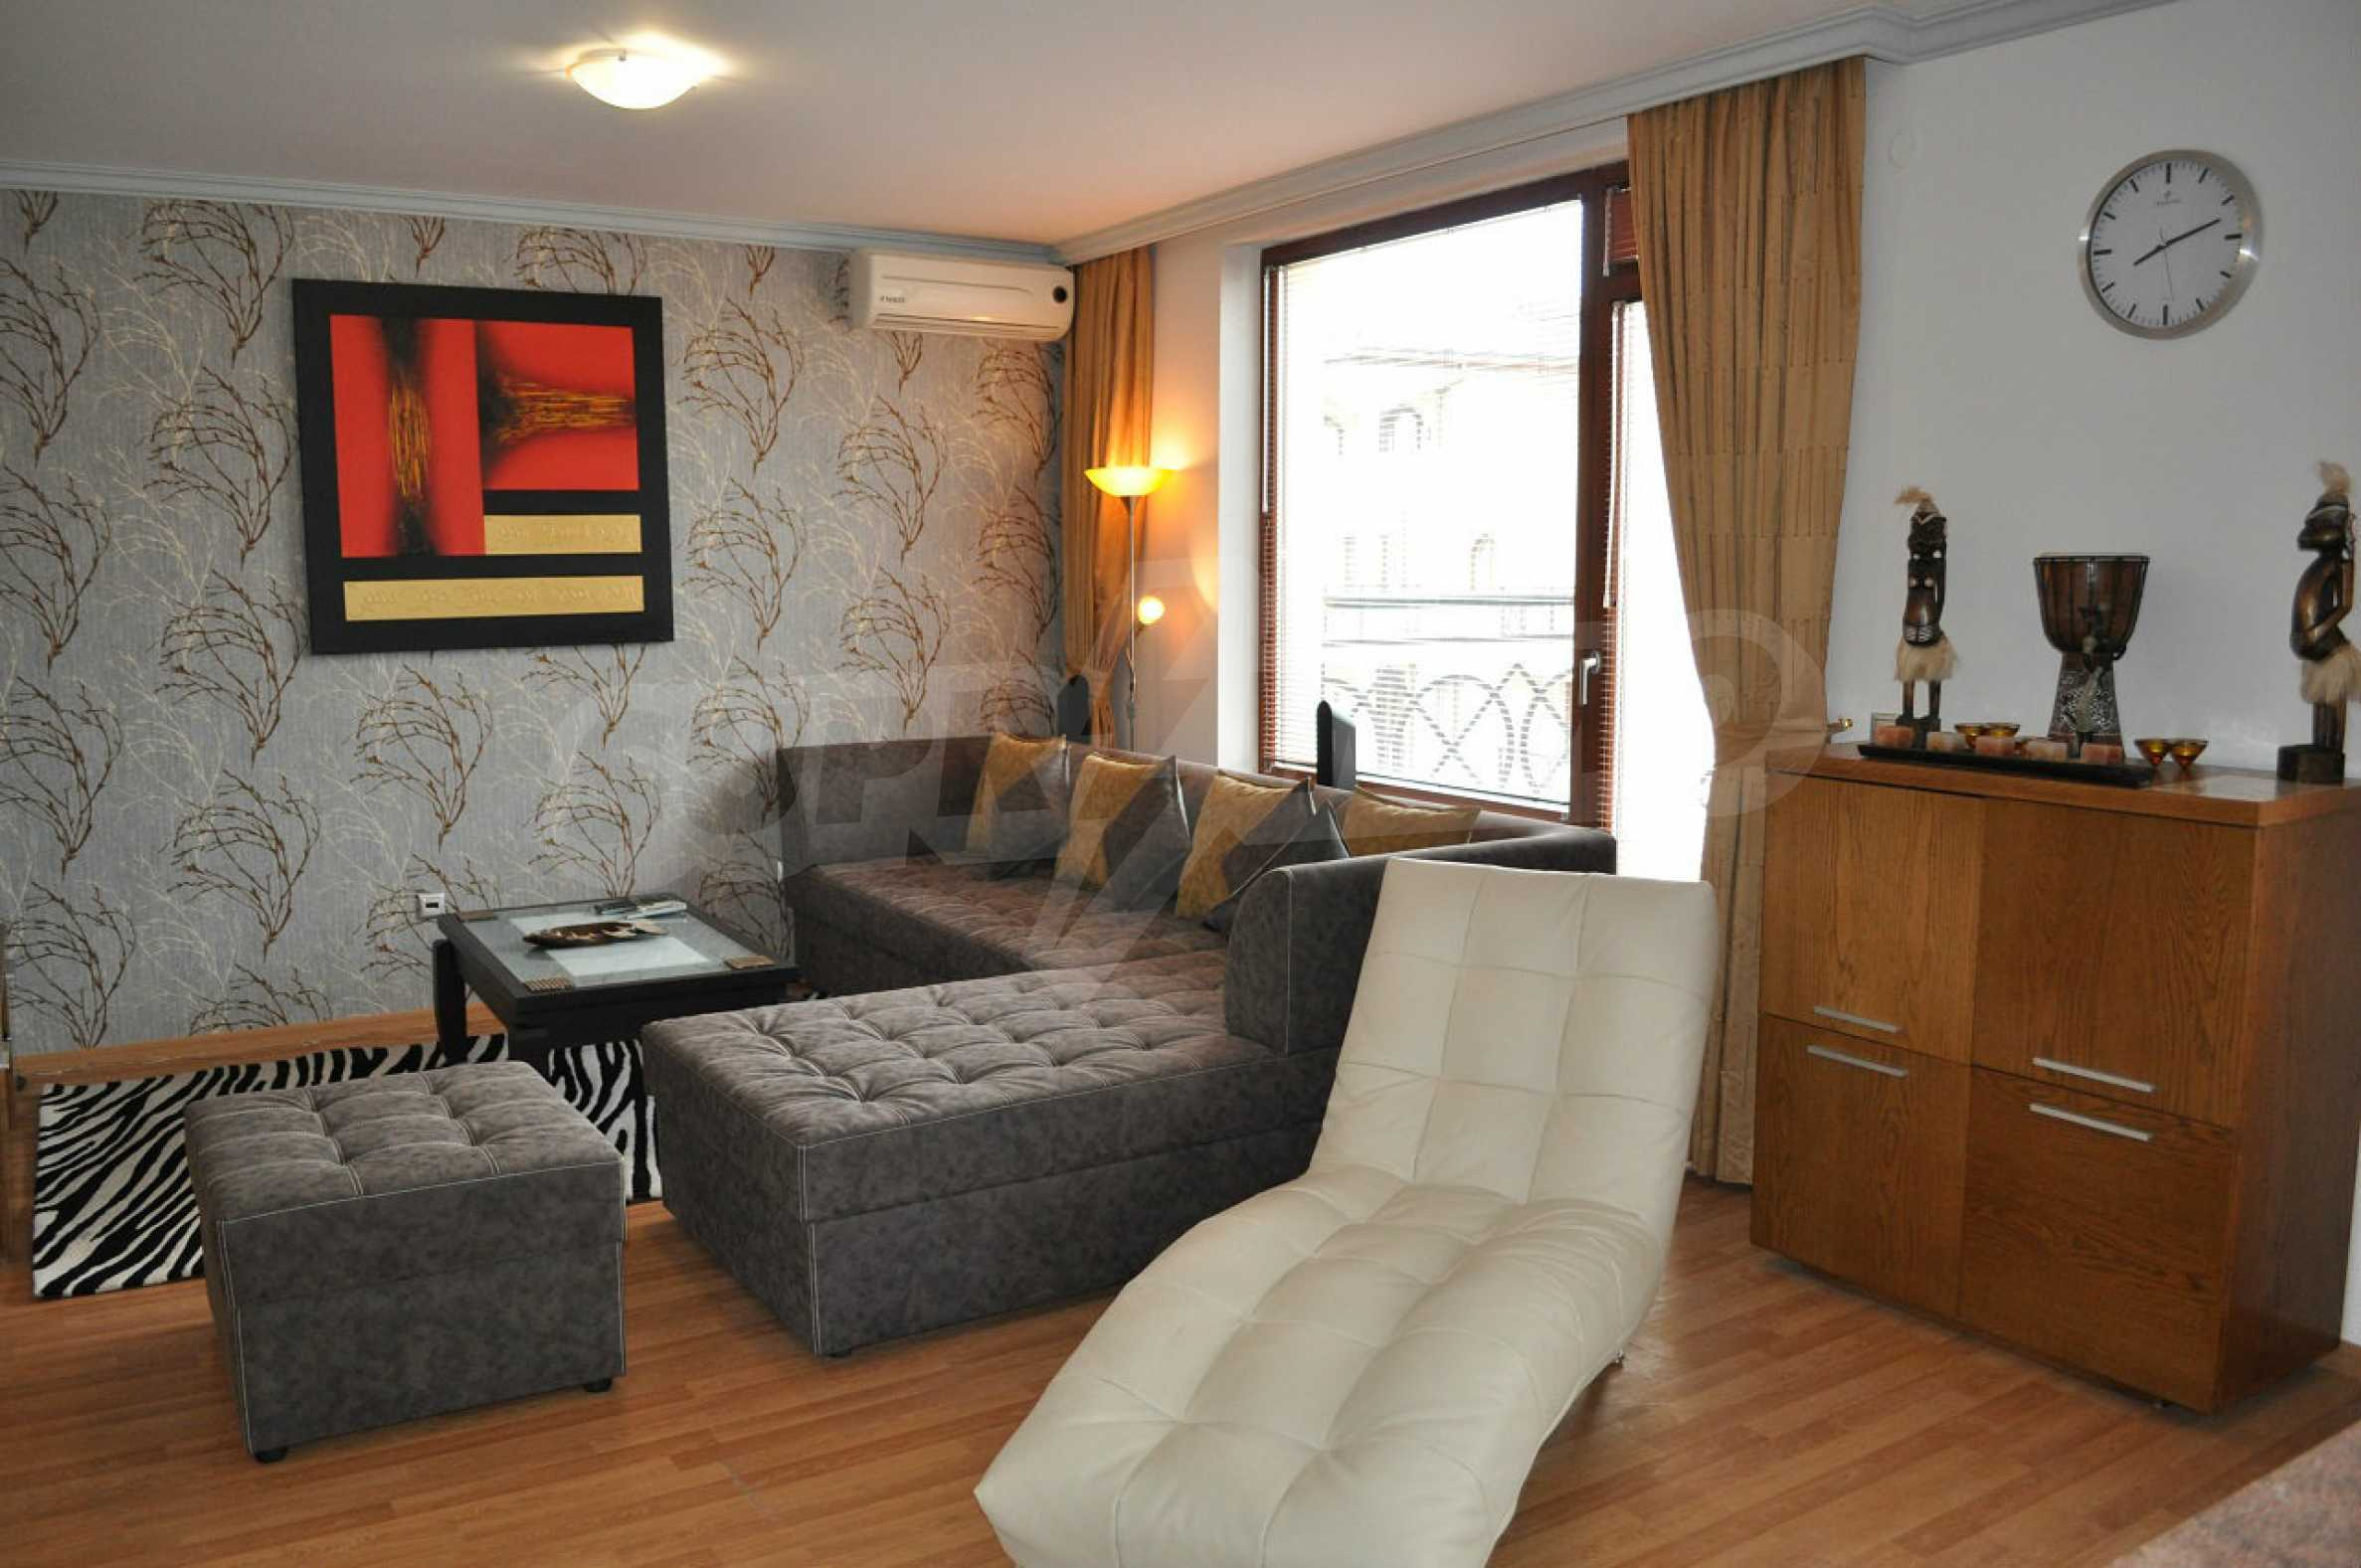 Apartment in Golden Sands 2